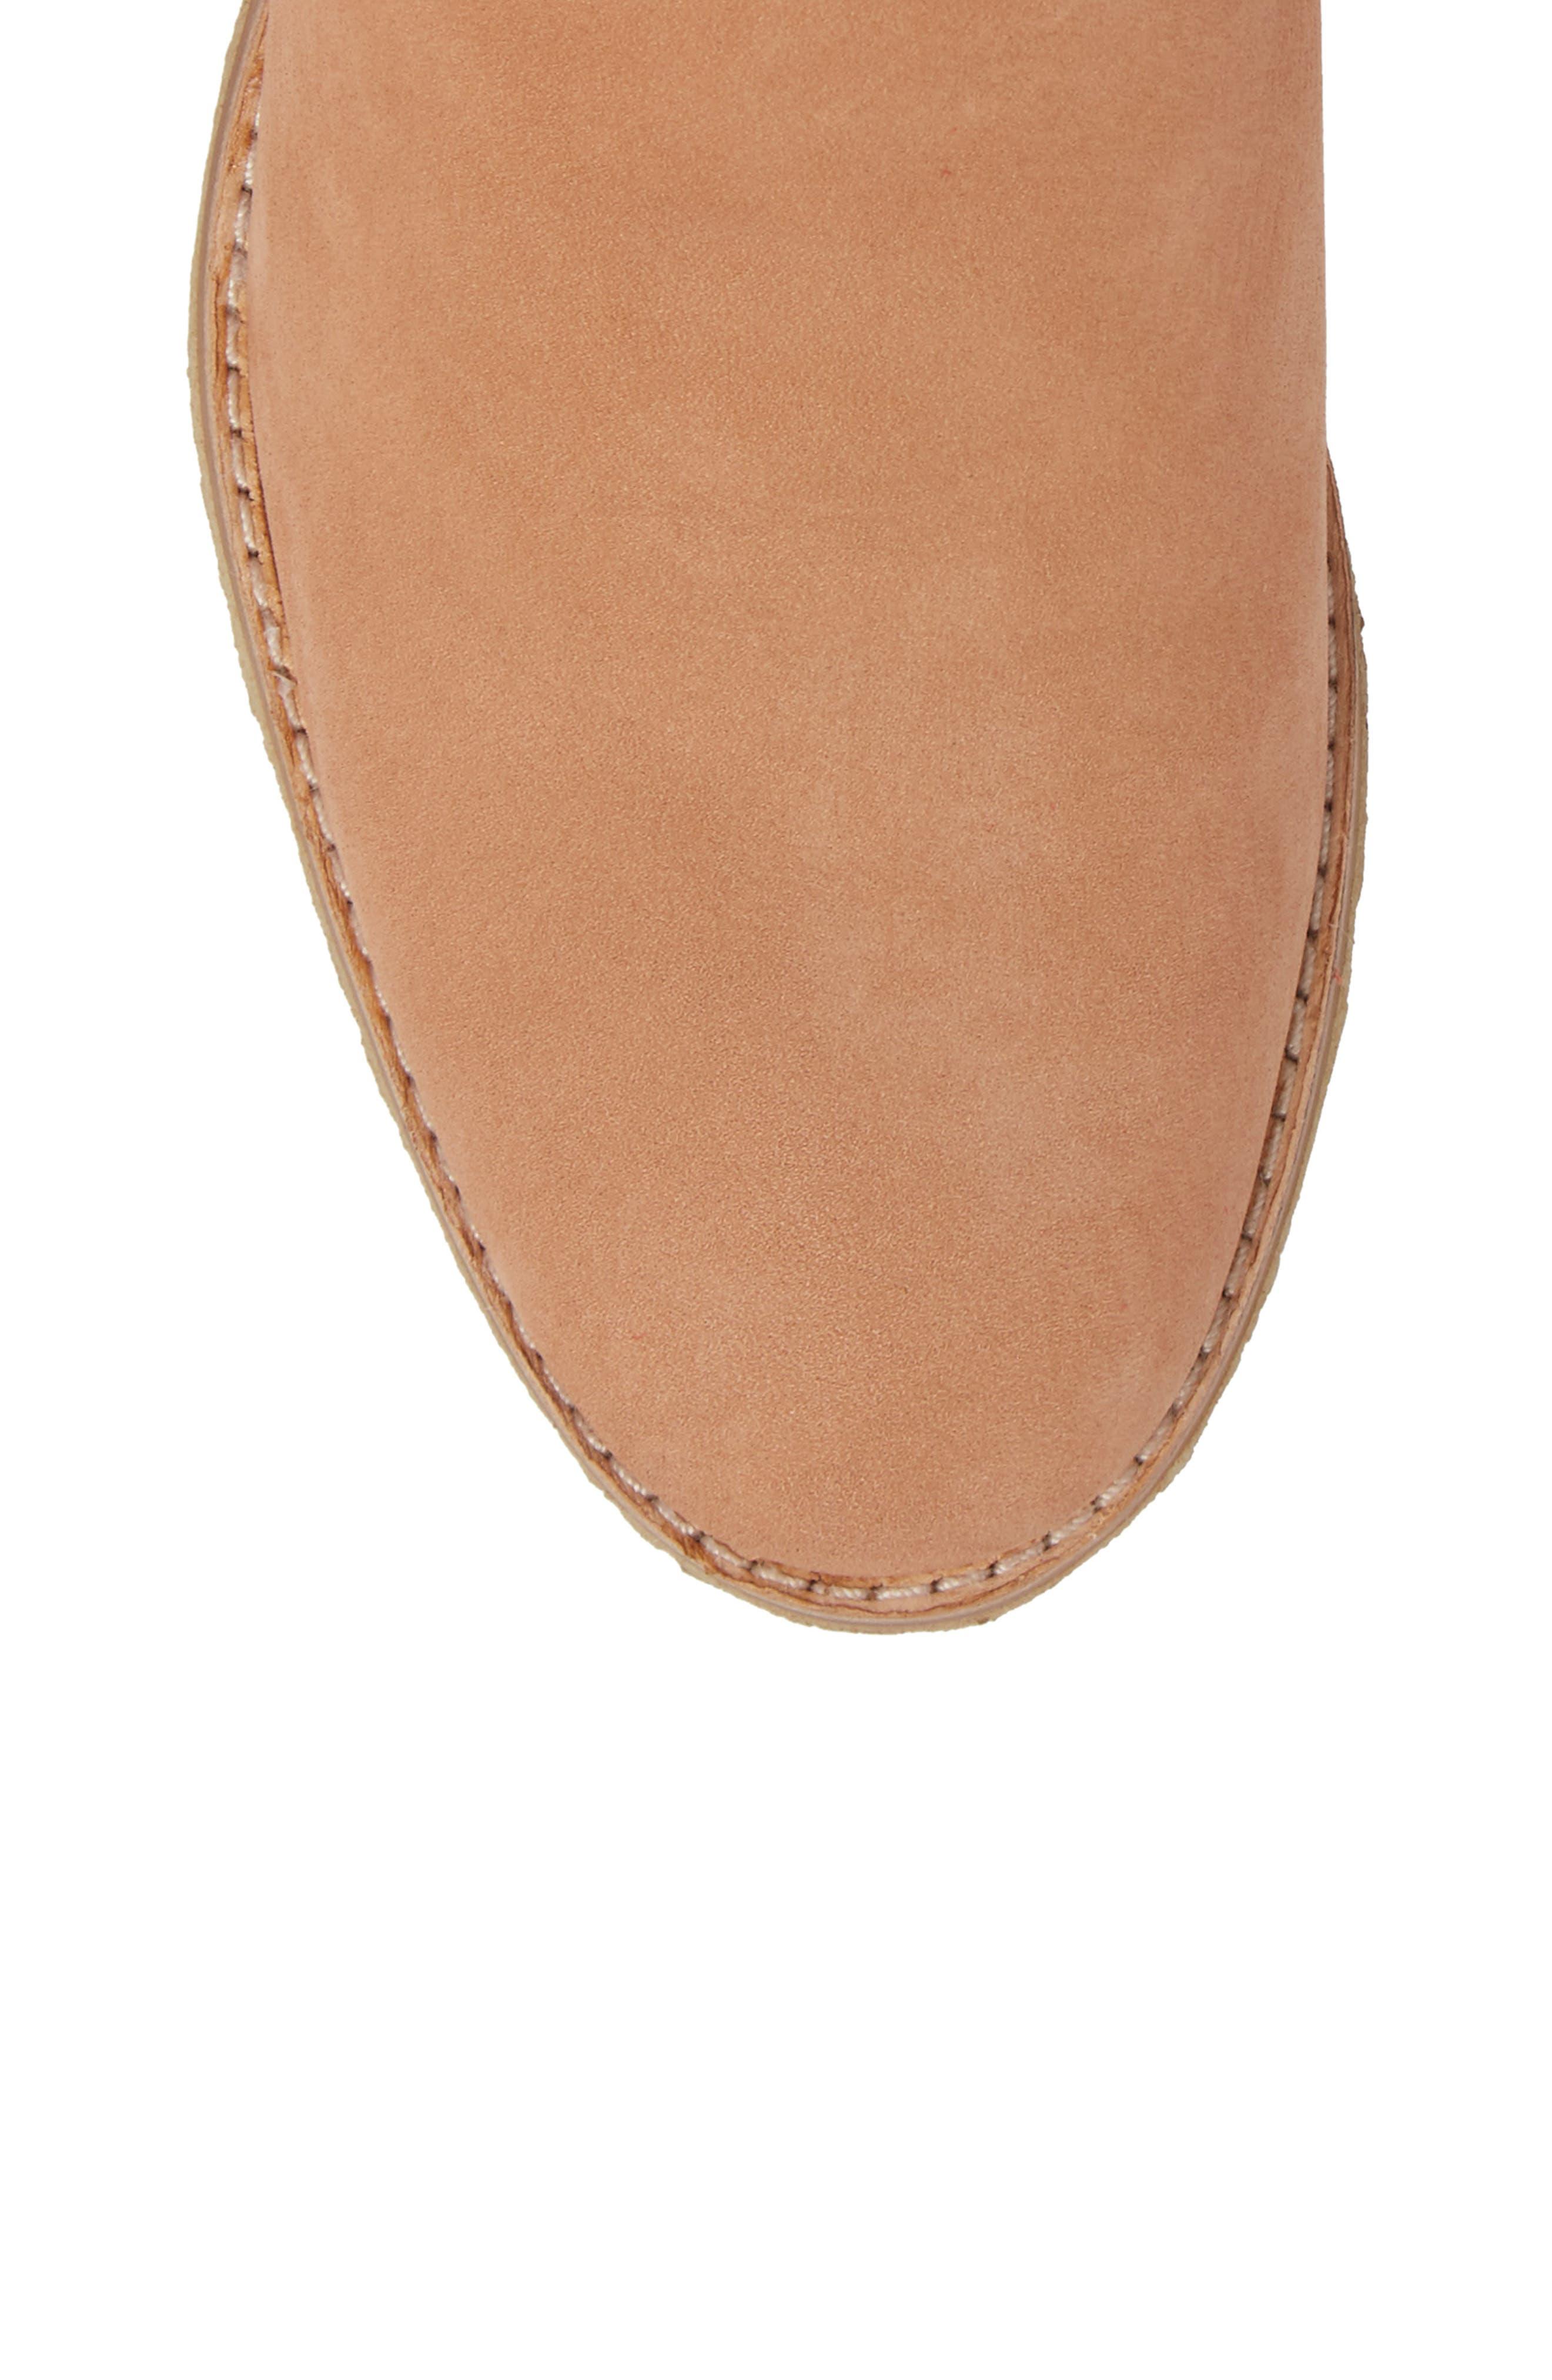 Amara Water Resistant Block Heel Bootie,                             Alternate thumbnail 5, color,                             SANDSTONE NUBUCK LEATHER